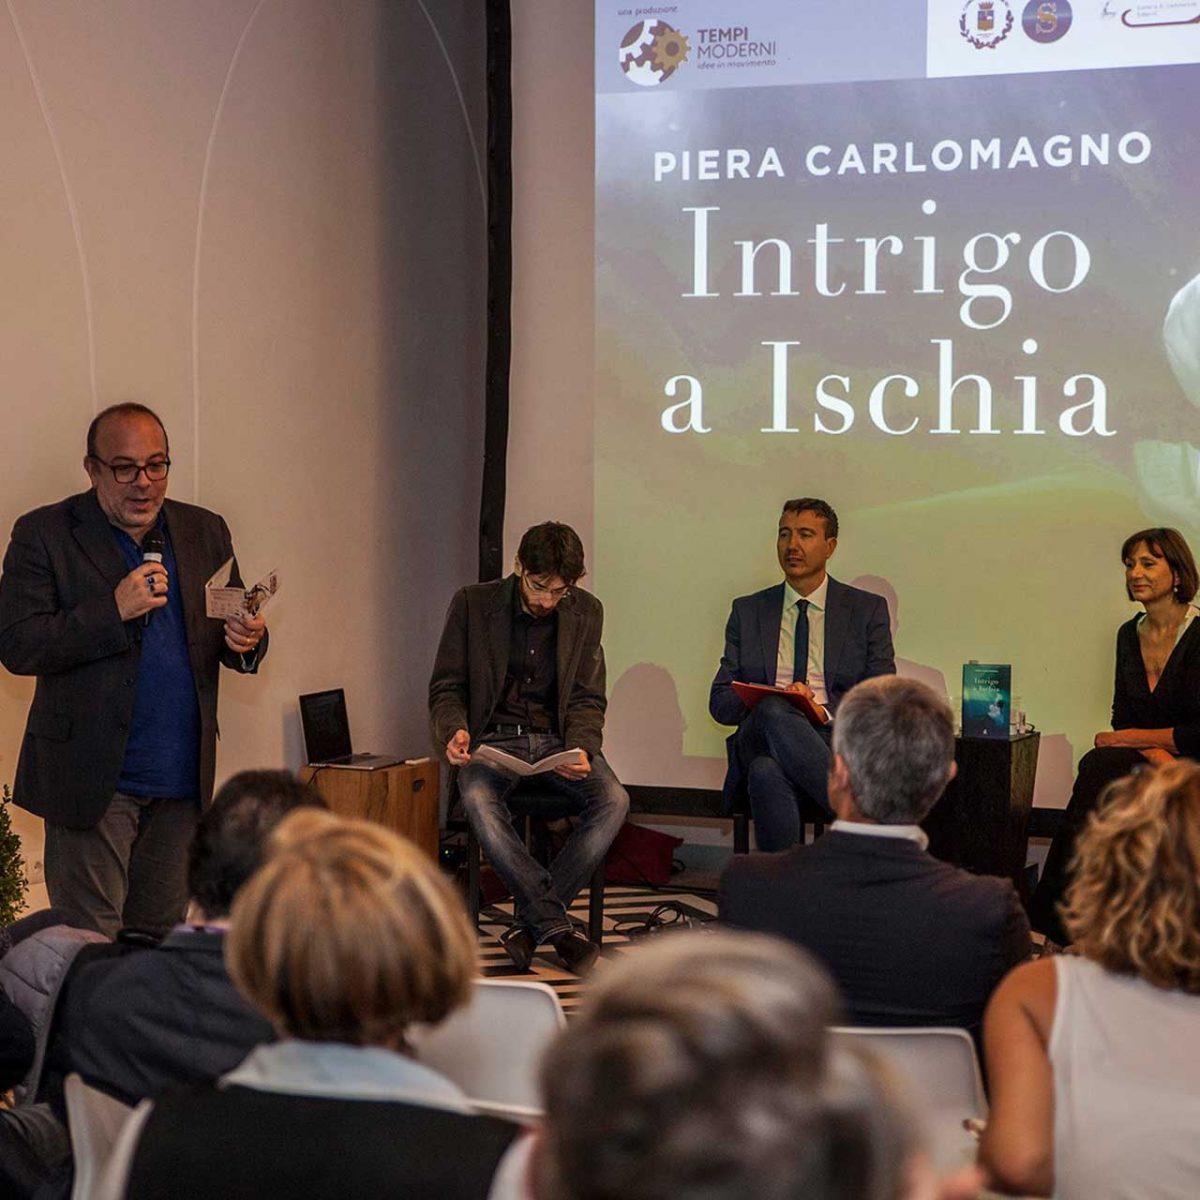 """Intrigo a Ischia"" di Piera Carlomagno con Elio Goka, Paolo Romano, Valerio Elia"